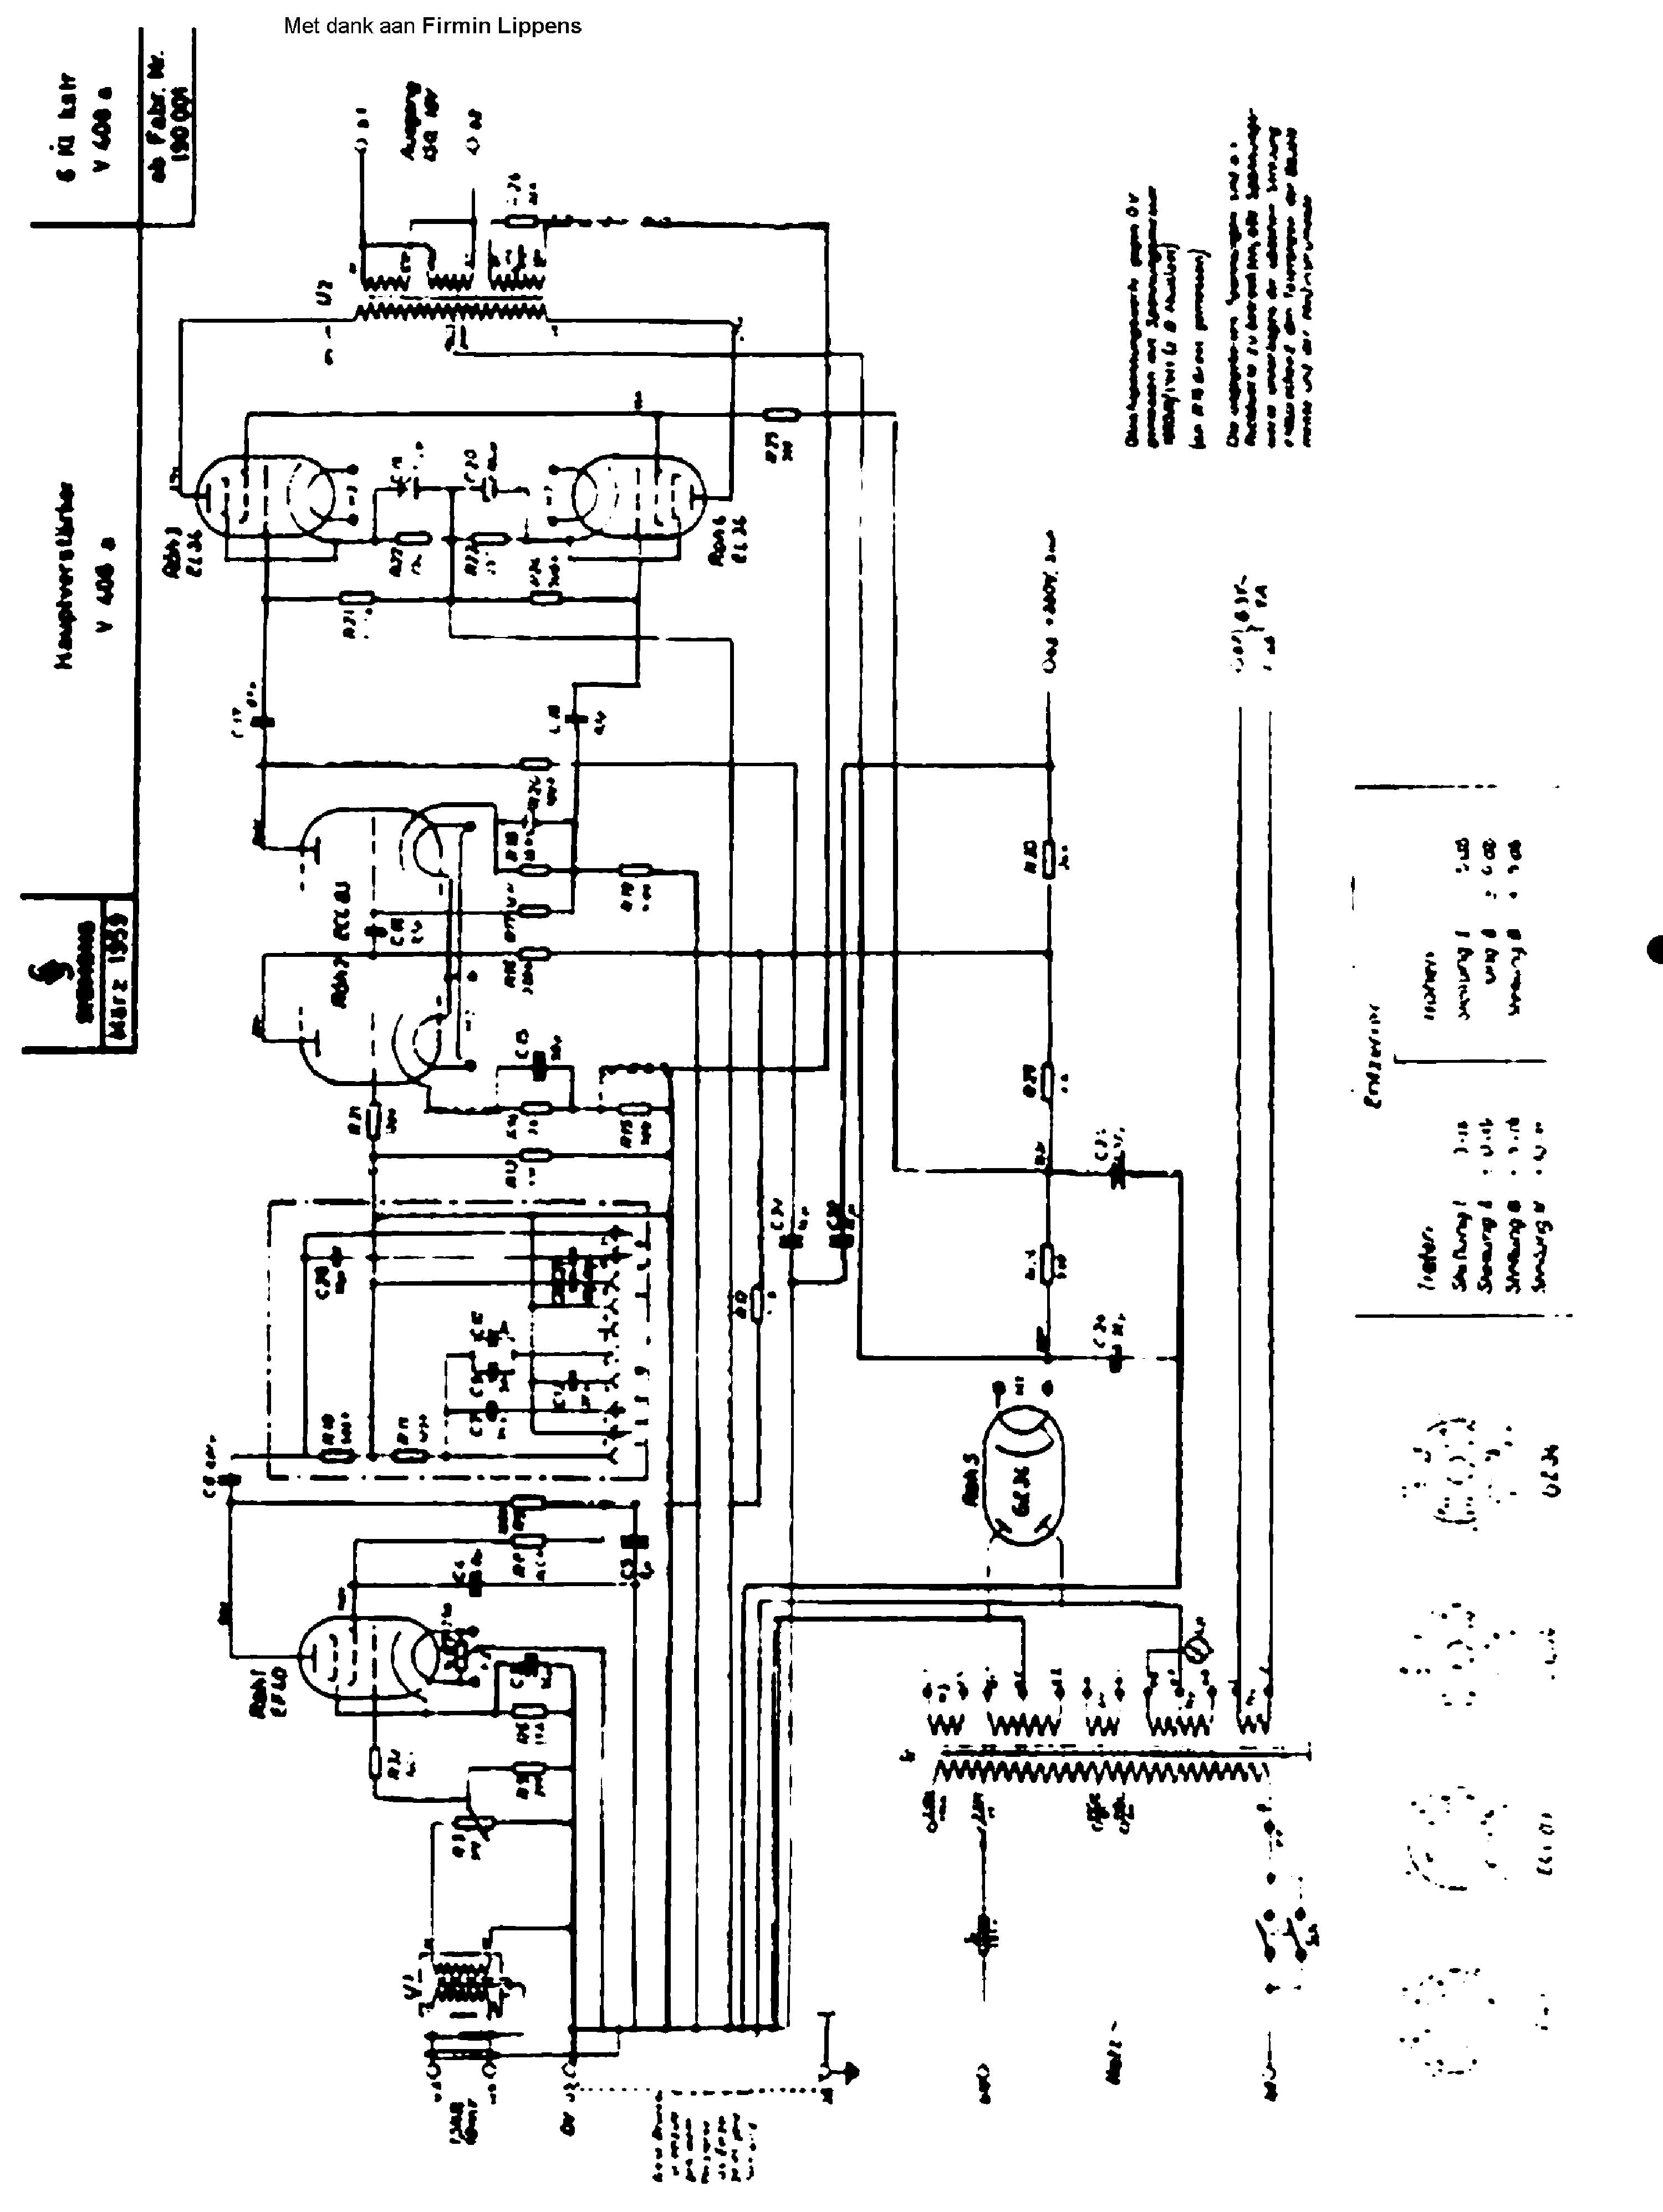 KLANGFILM V408 SIEMENS V408A AMPLIFIER SCH service manual (1st page)